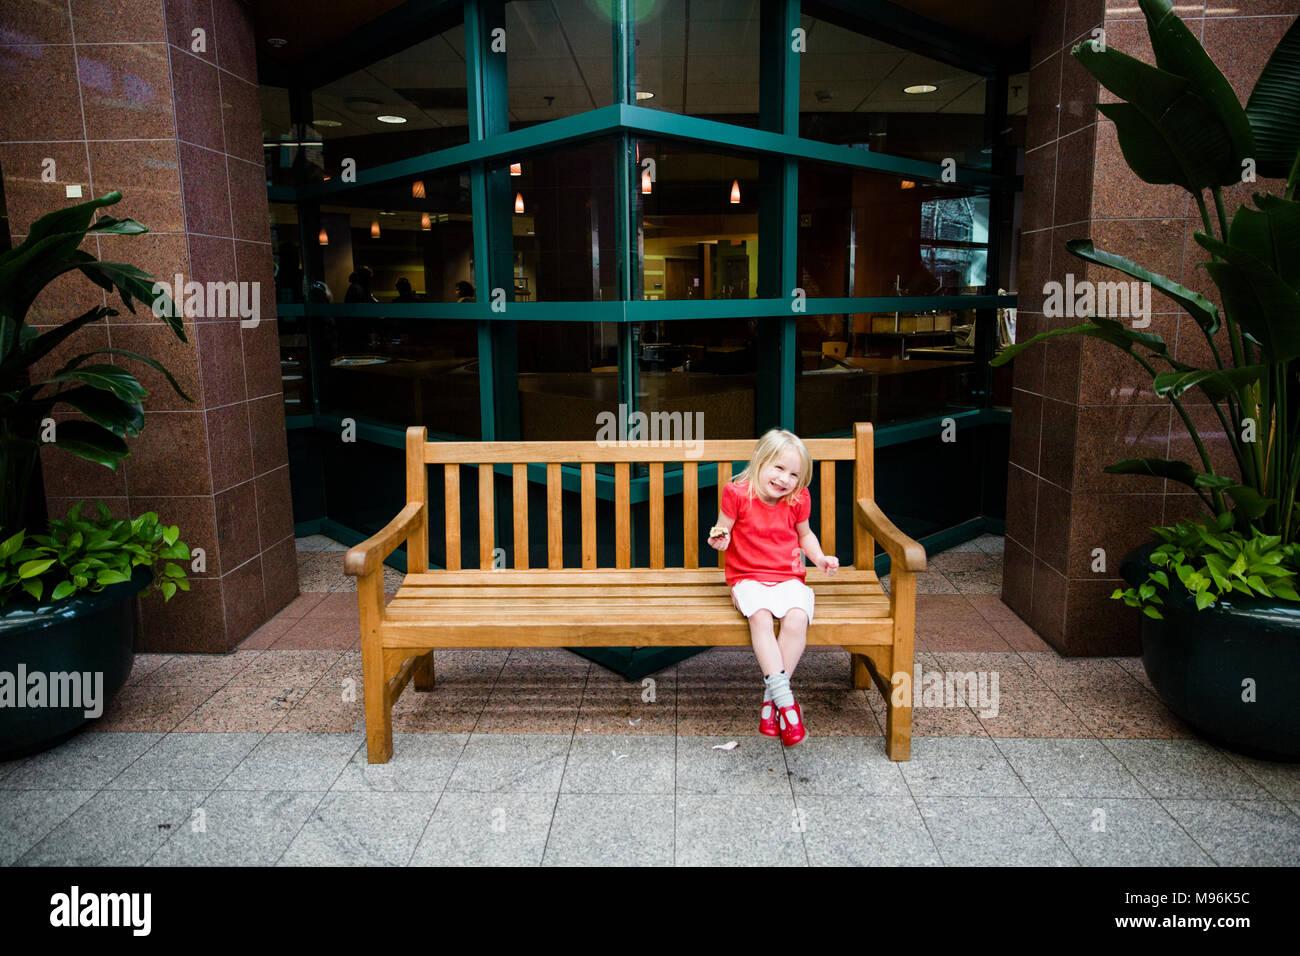 Girl in red shirt assis sur banc en bois Photo Stock